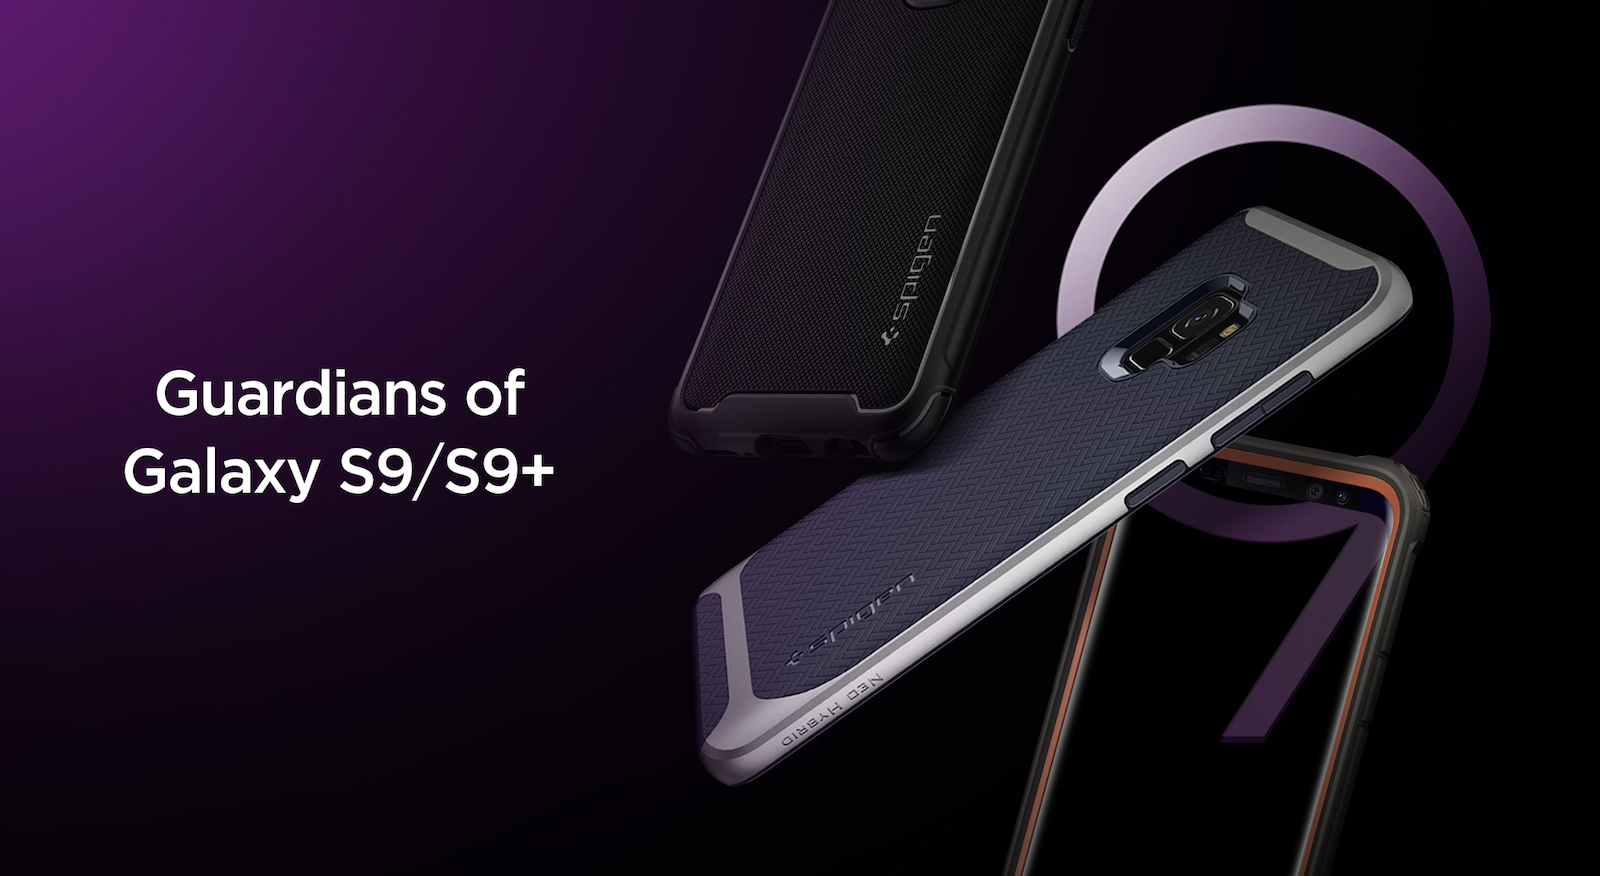 best website 0b687 92691 Spigen launches Samsung Galaxy S9 & S9 Plus cases & accessories ...